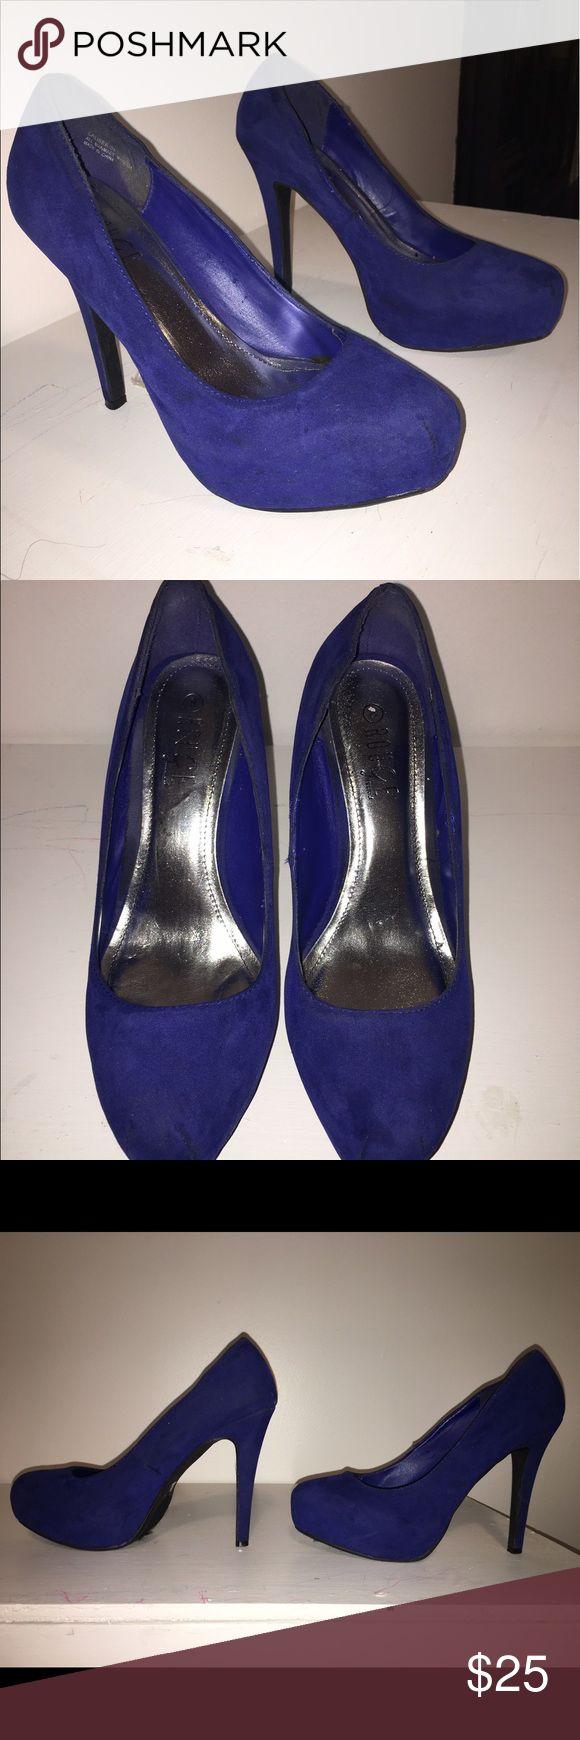 Navy Blue High Heels Platform heels so about 4in. Size 8. Velvet material. Worn once. Shoes Platforms